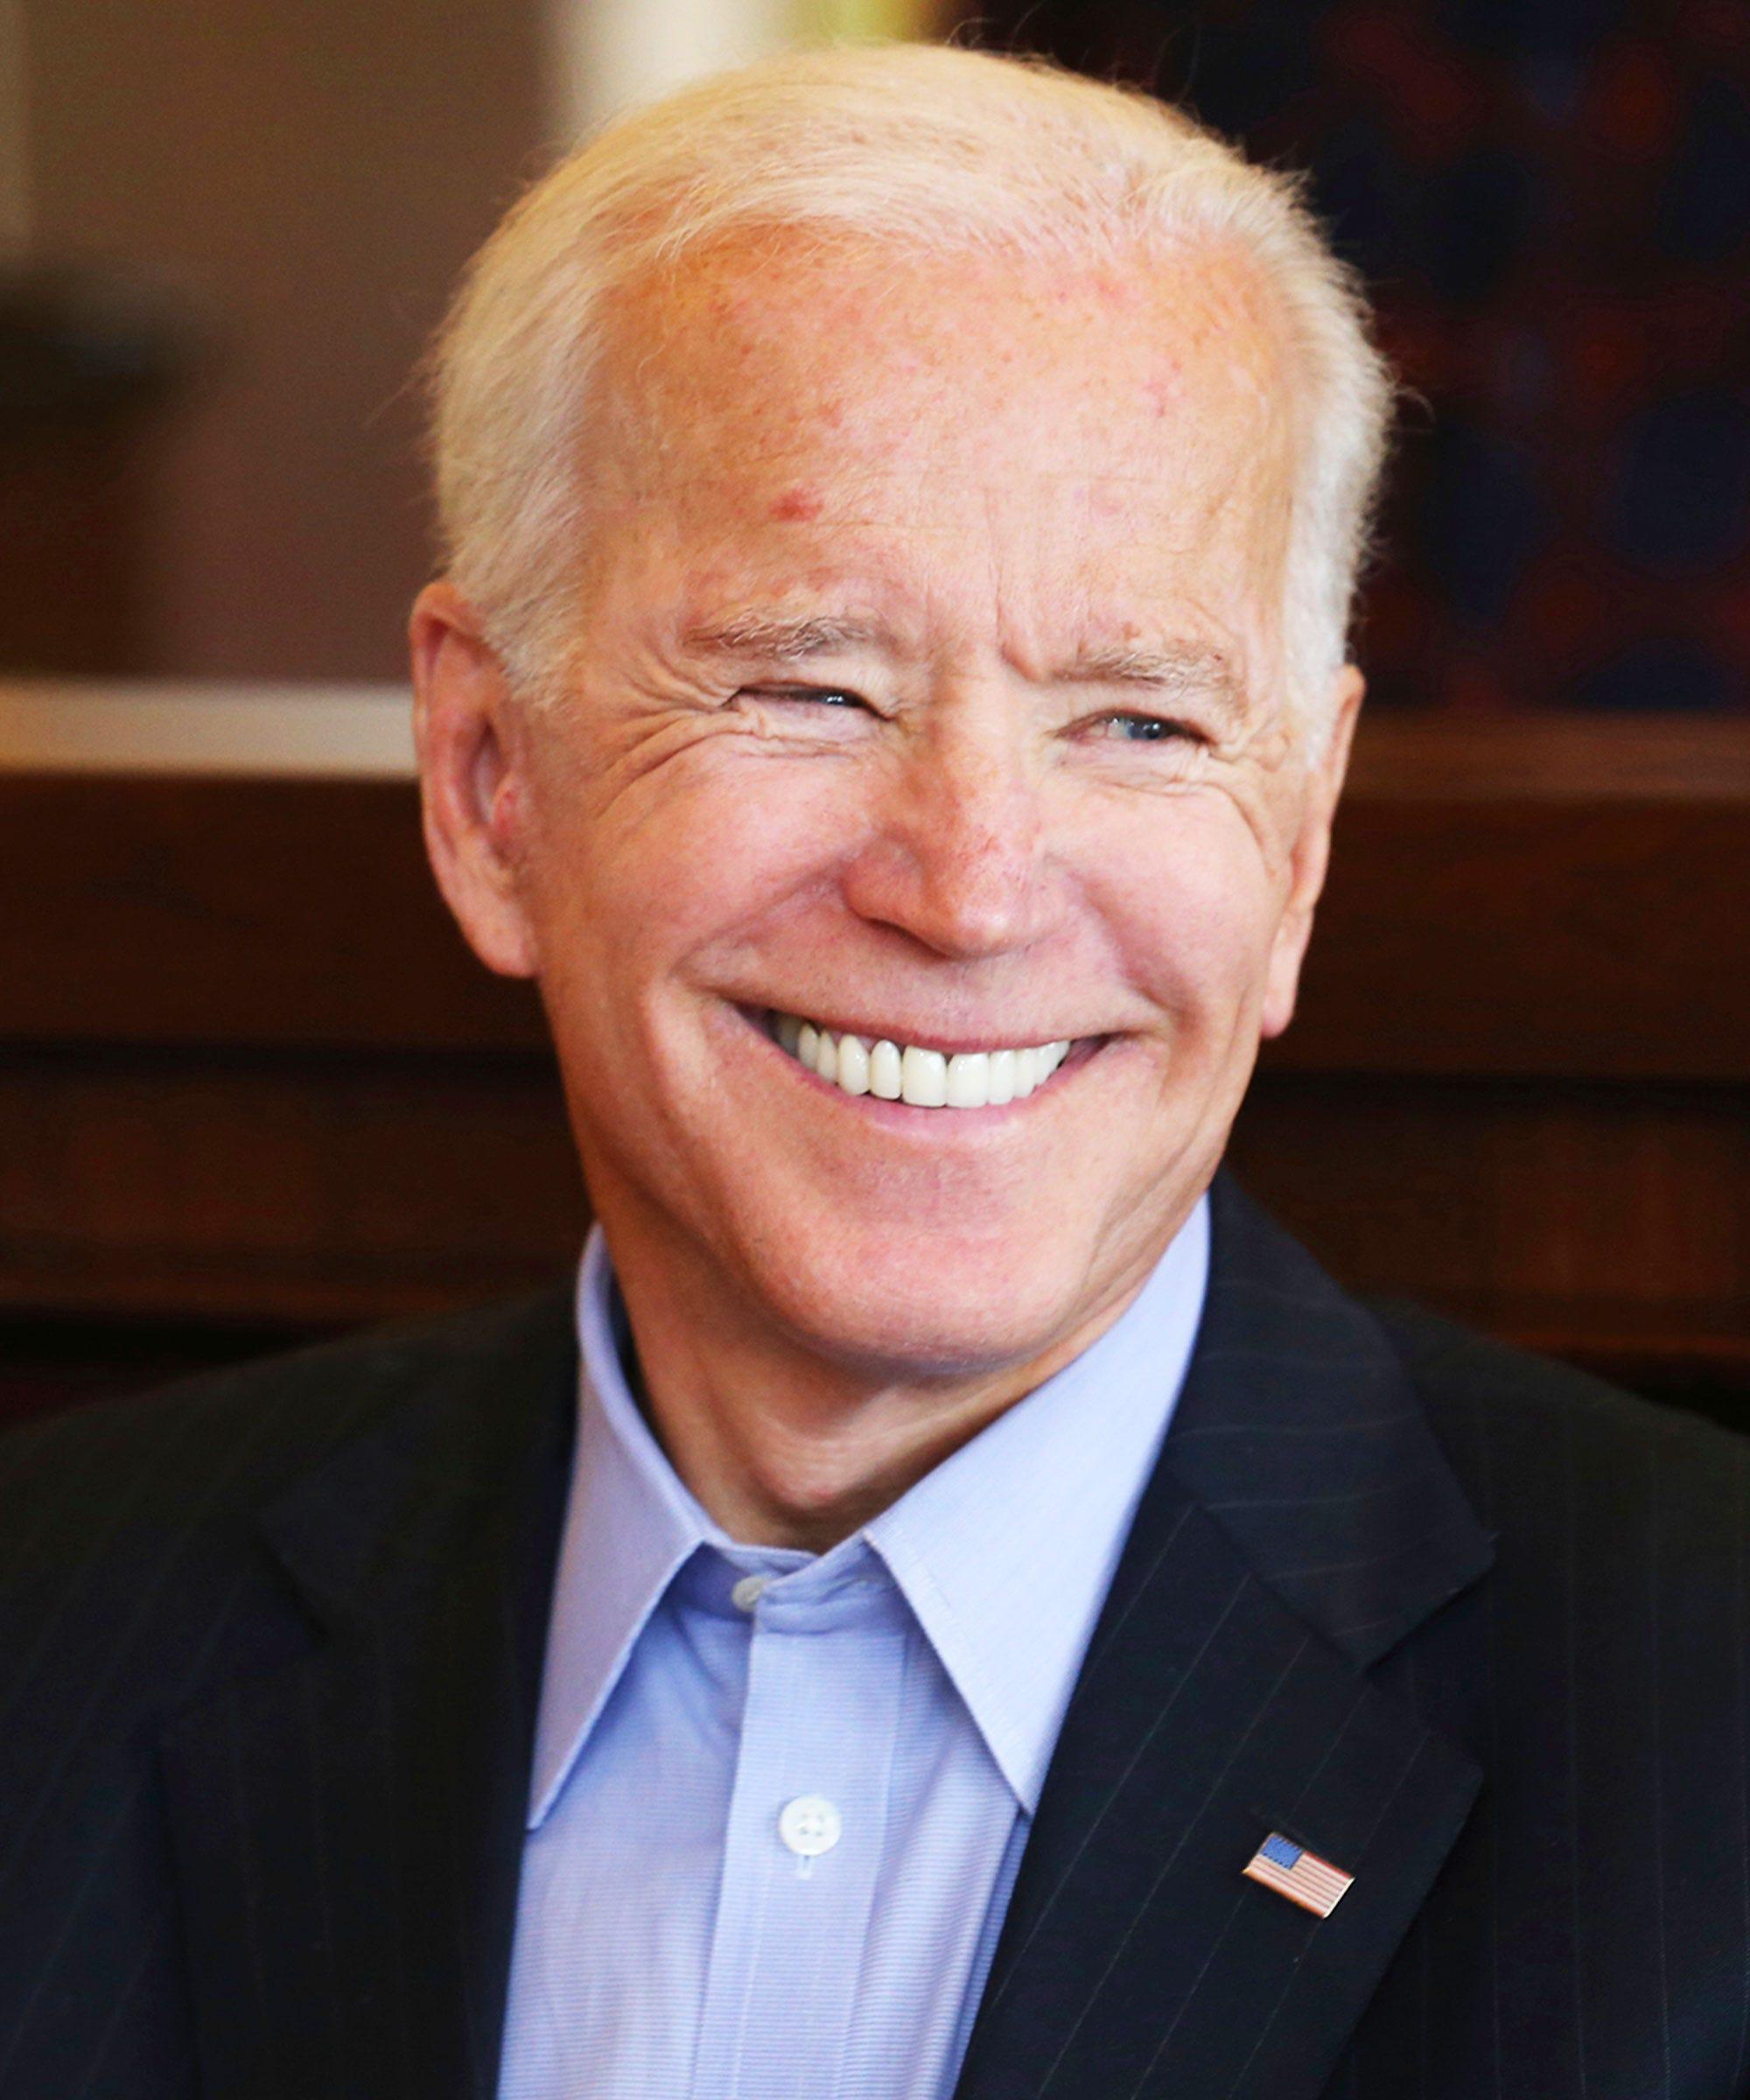 It's Finally Official: Joe Biden Is Running For President